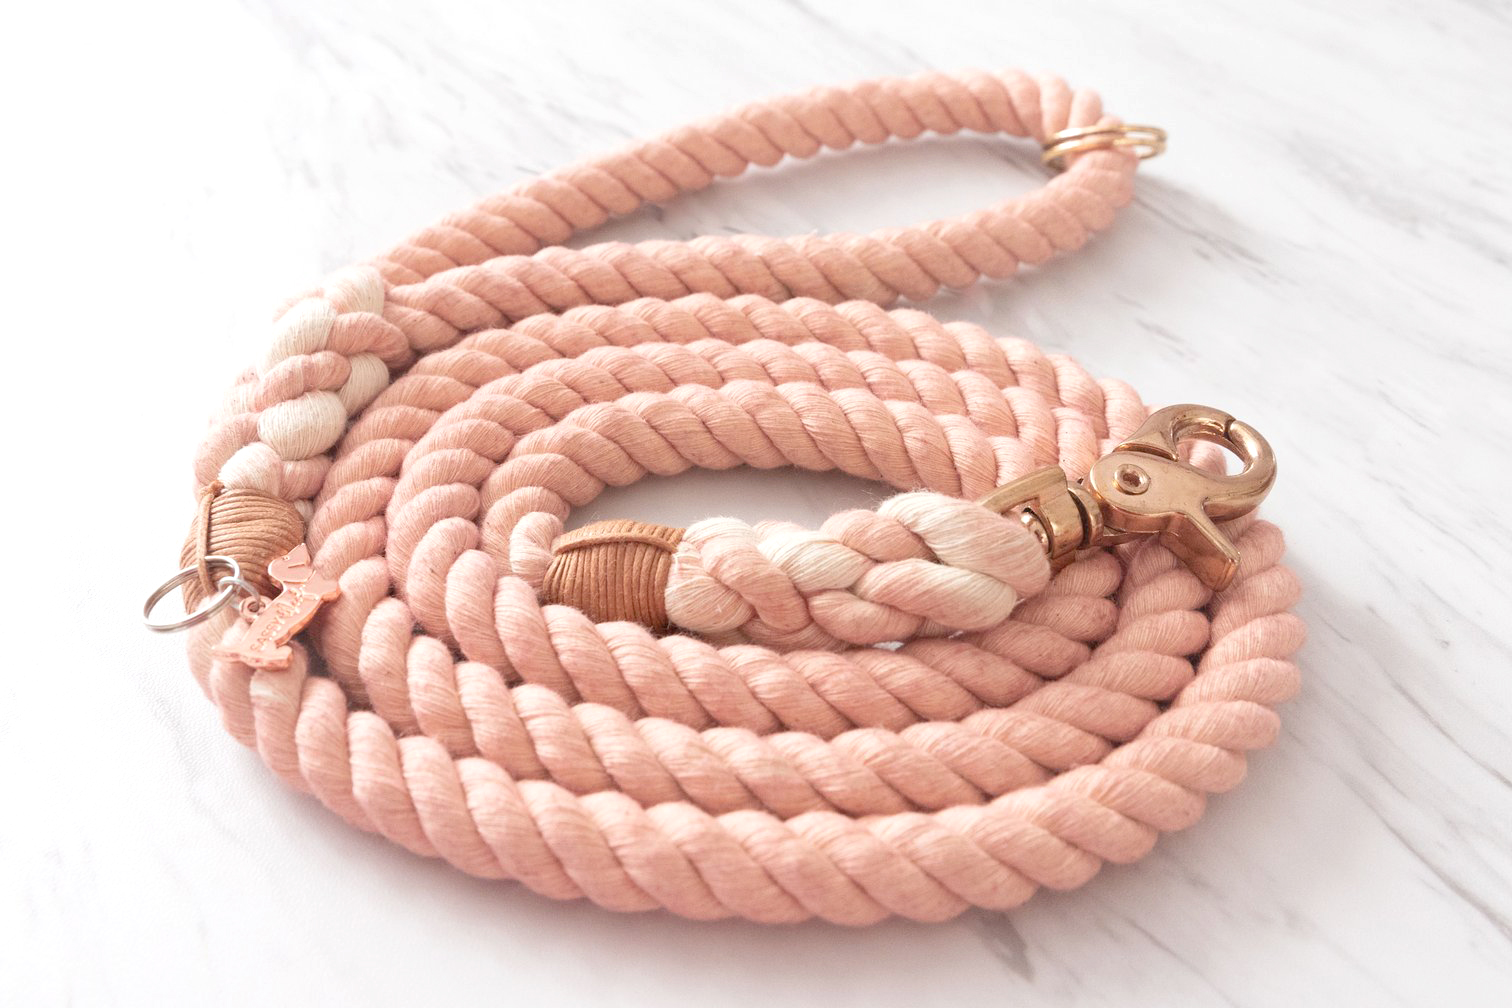 Blush Dog Leash By Sassy Woof on The Dapple: Dog Lifestyle Site